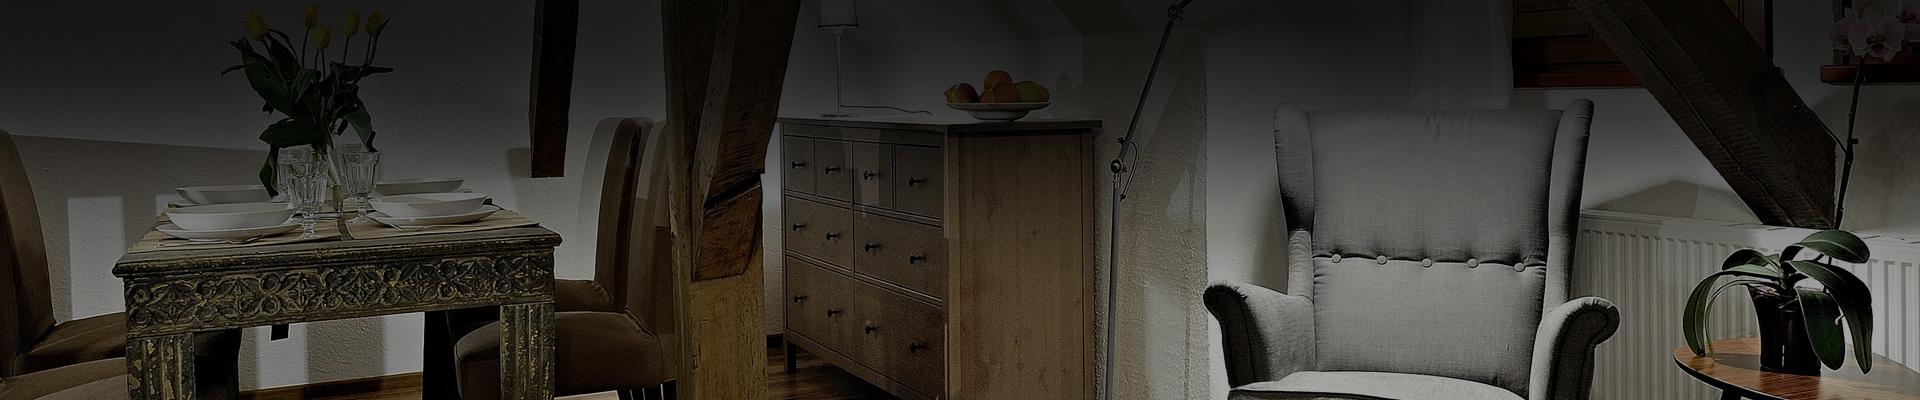 Apartamenty-Oapartamentach